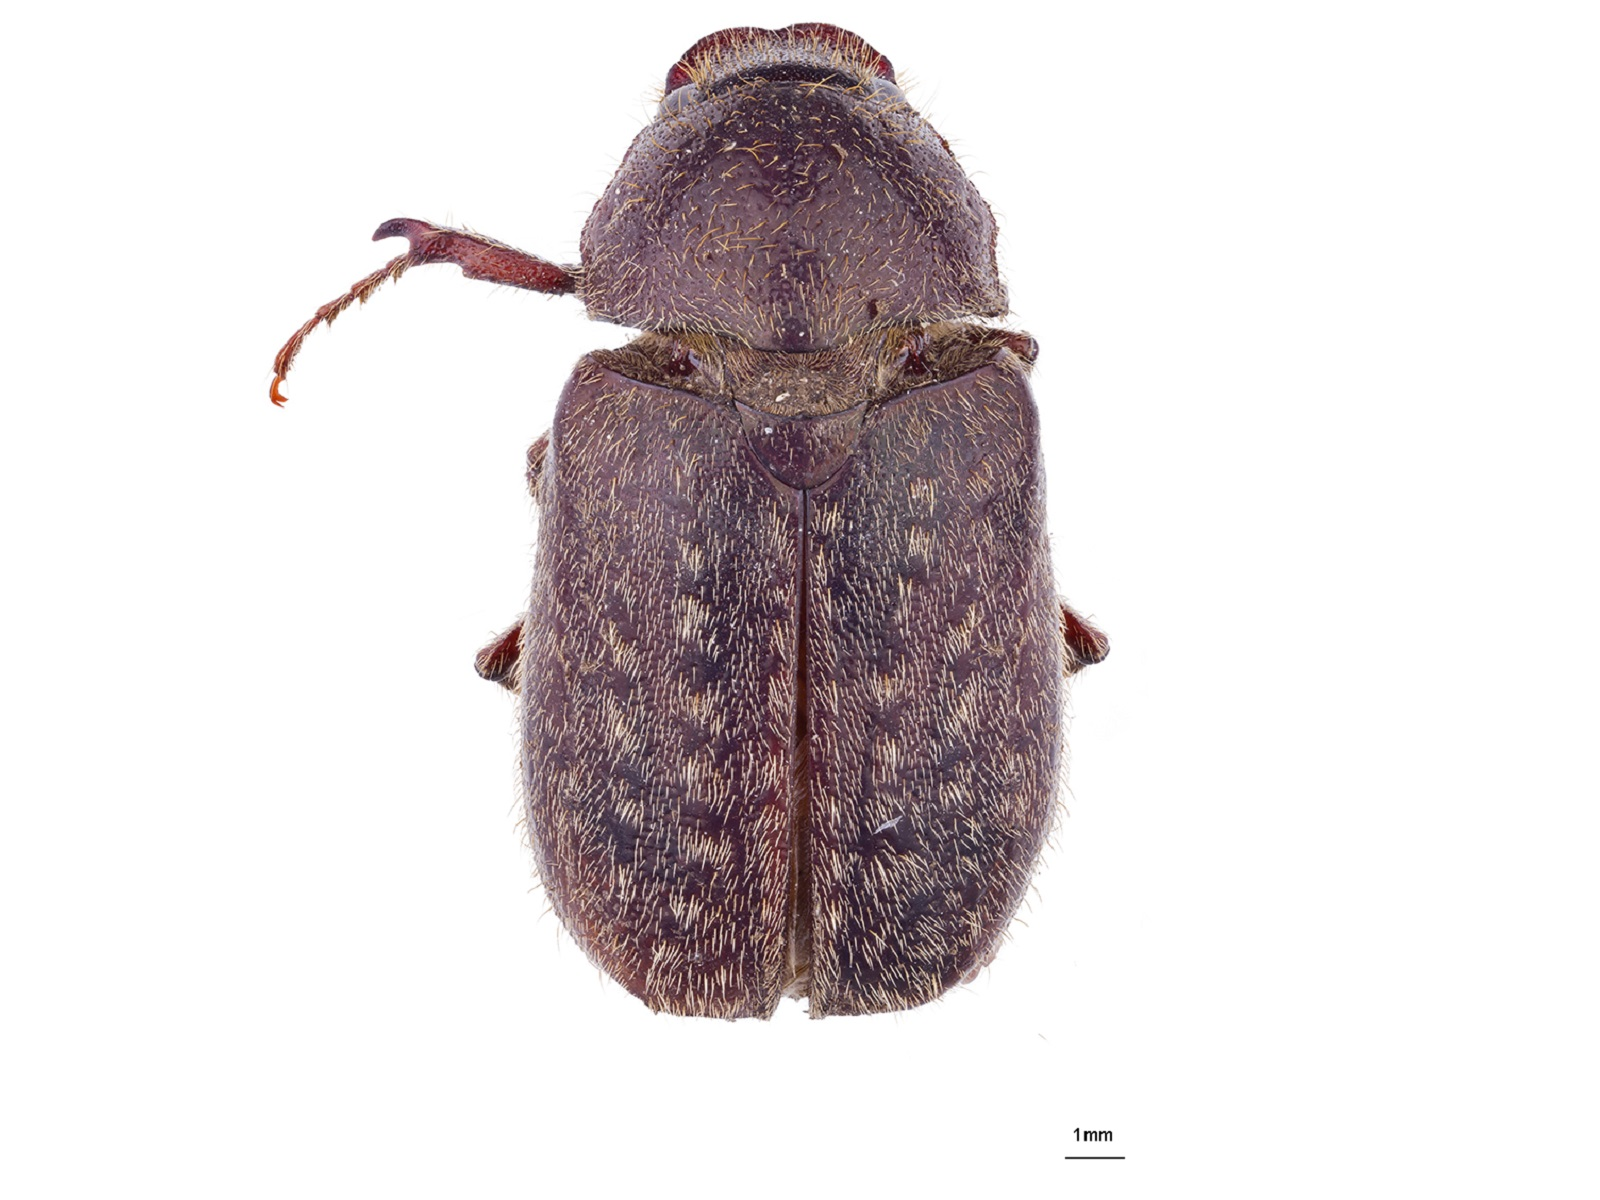 Plectris pavida (Burmeister, 1855)